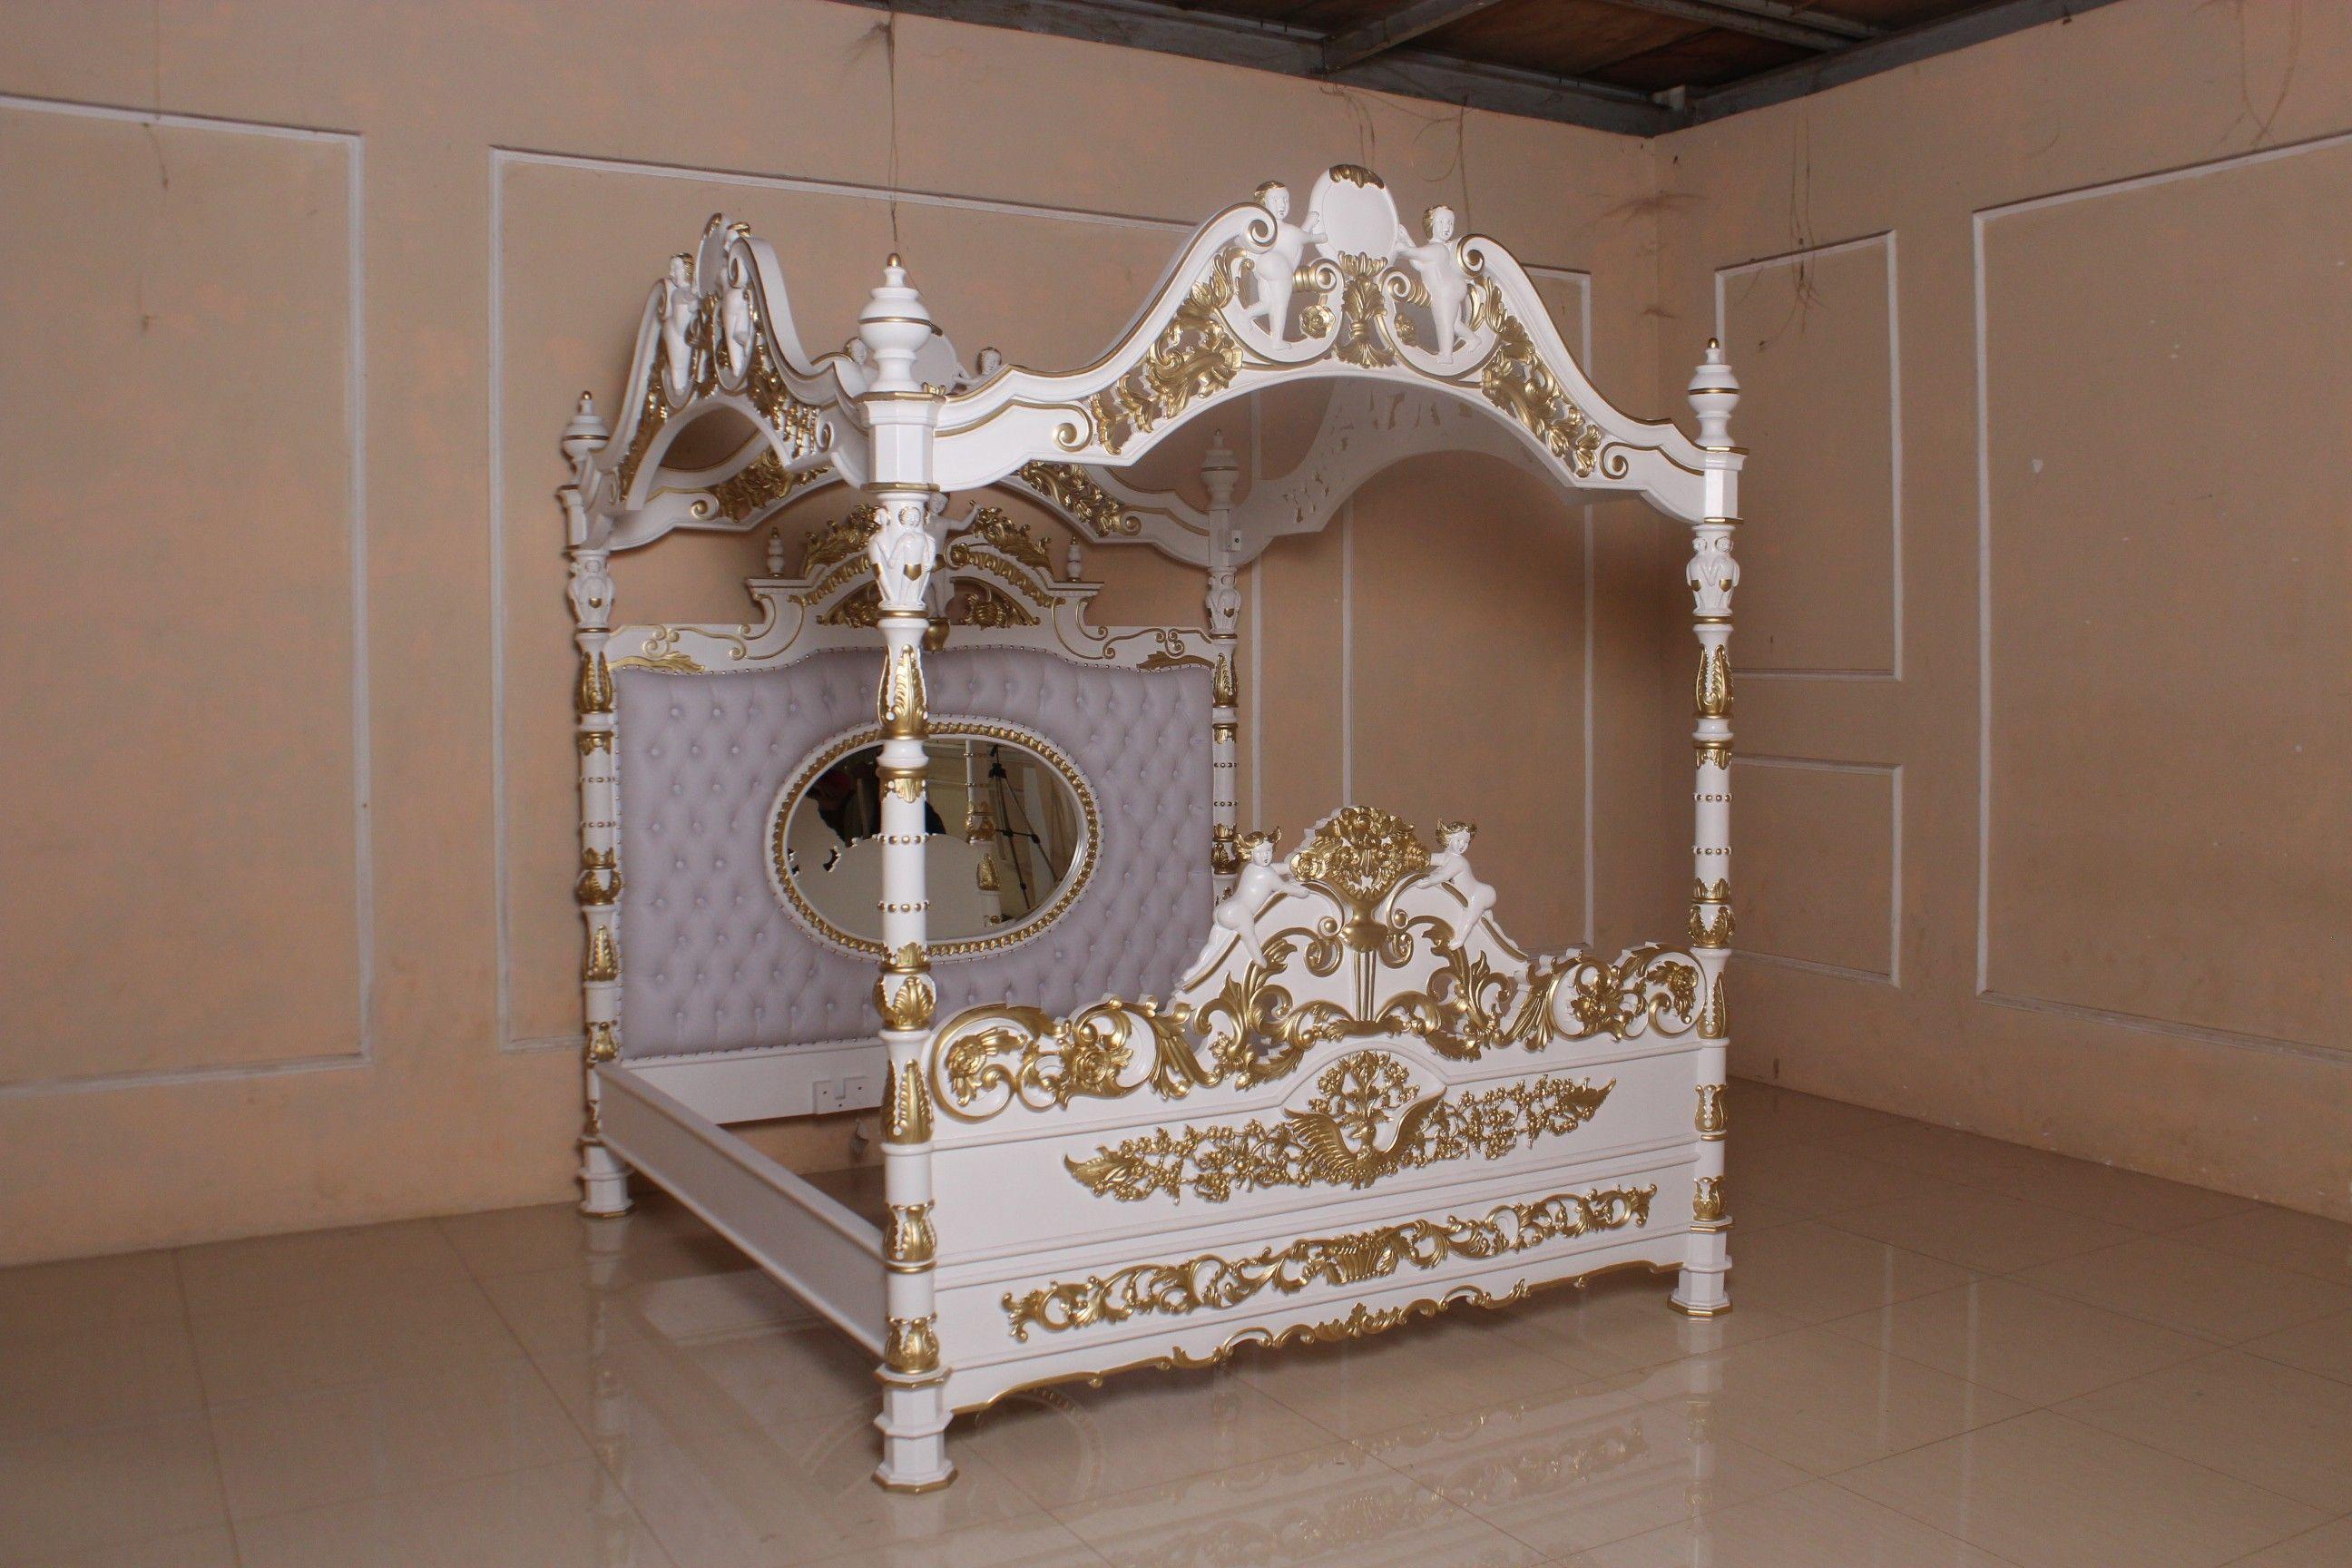 barock bett engelhimmelbett betten onlineshop repro. Black Bedroom Furniture Sets. Home Design Ideas